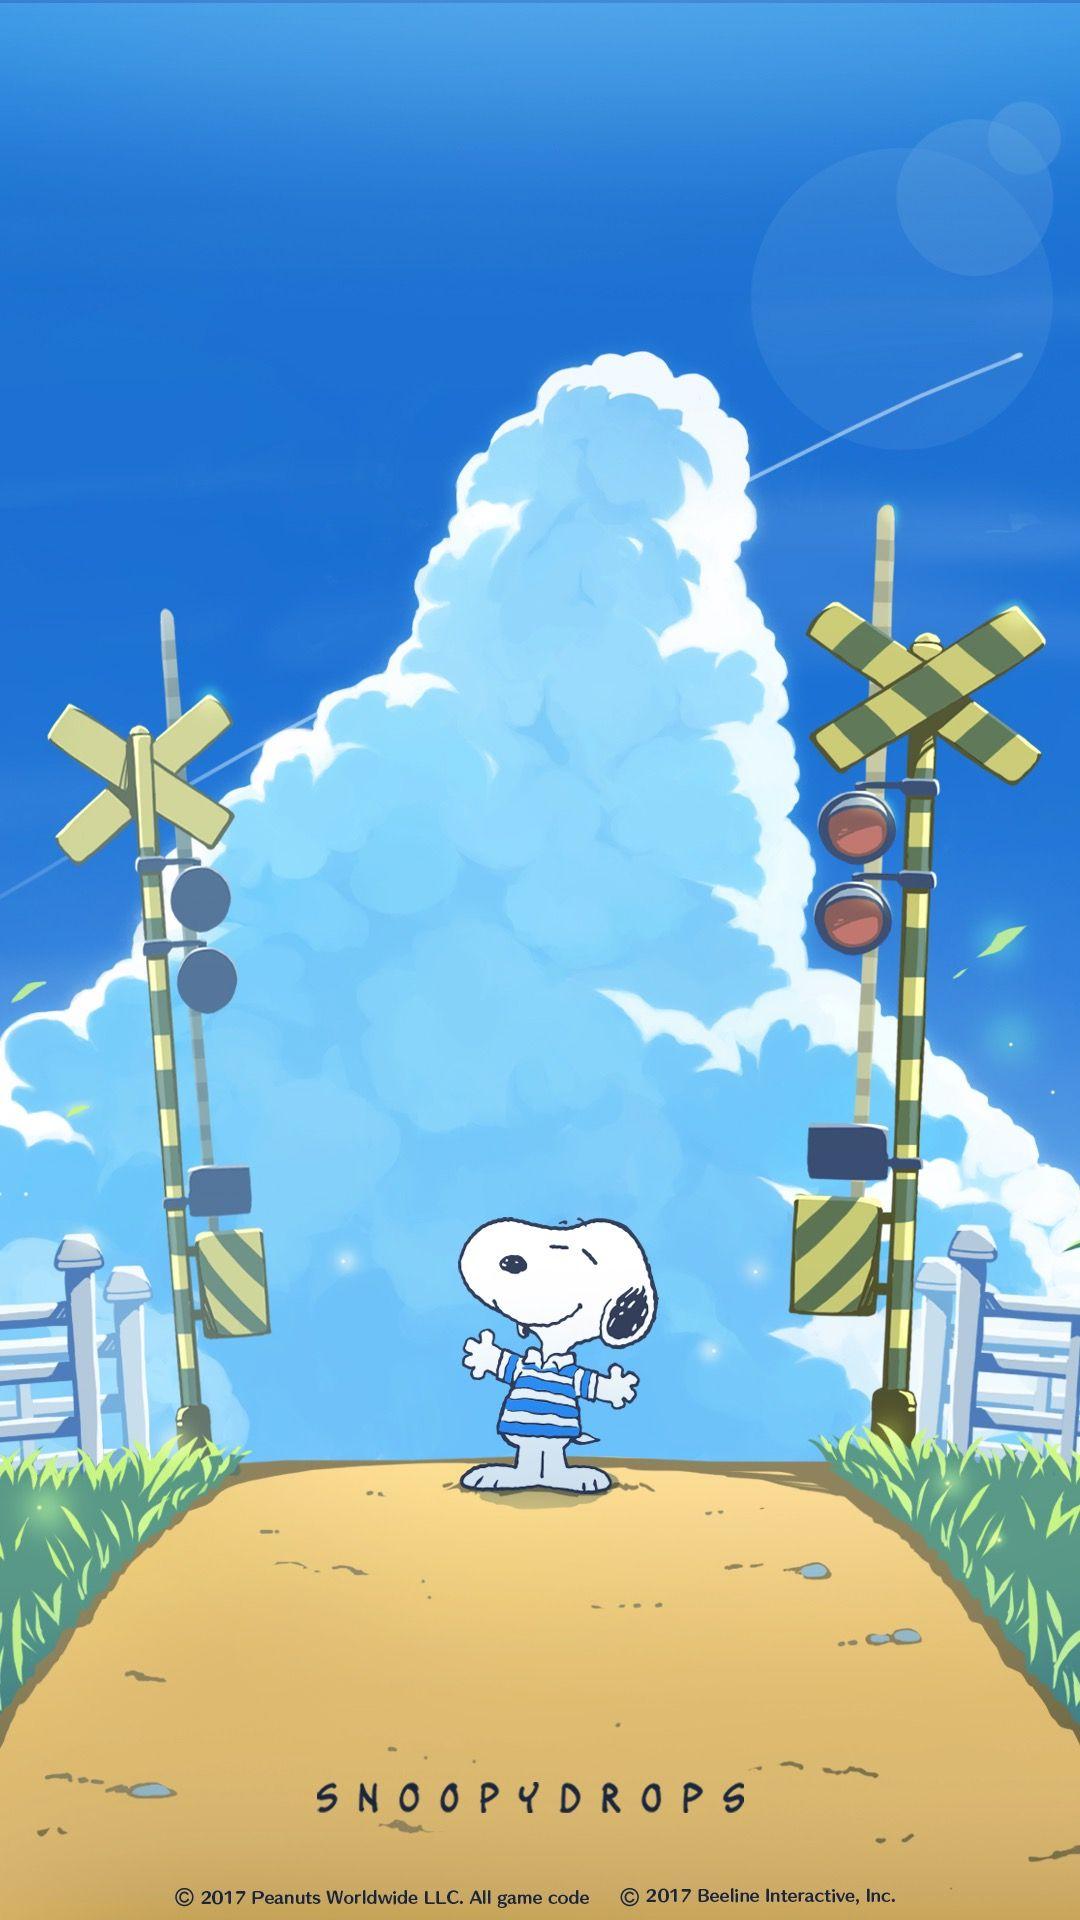 Snoopy At Railroad Tracks 画像あり スヌーピーの壁紙 携帯電話